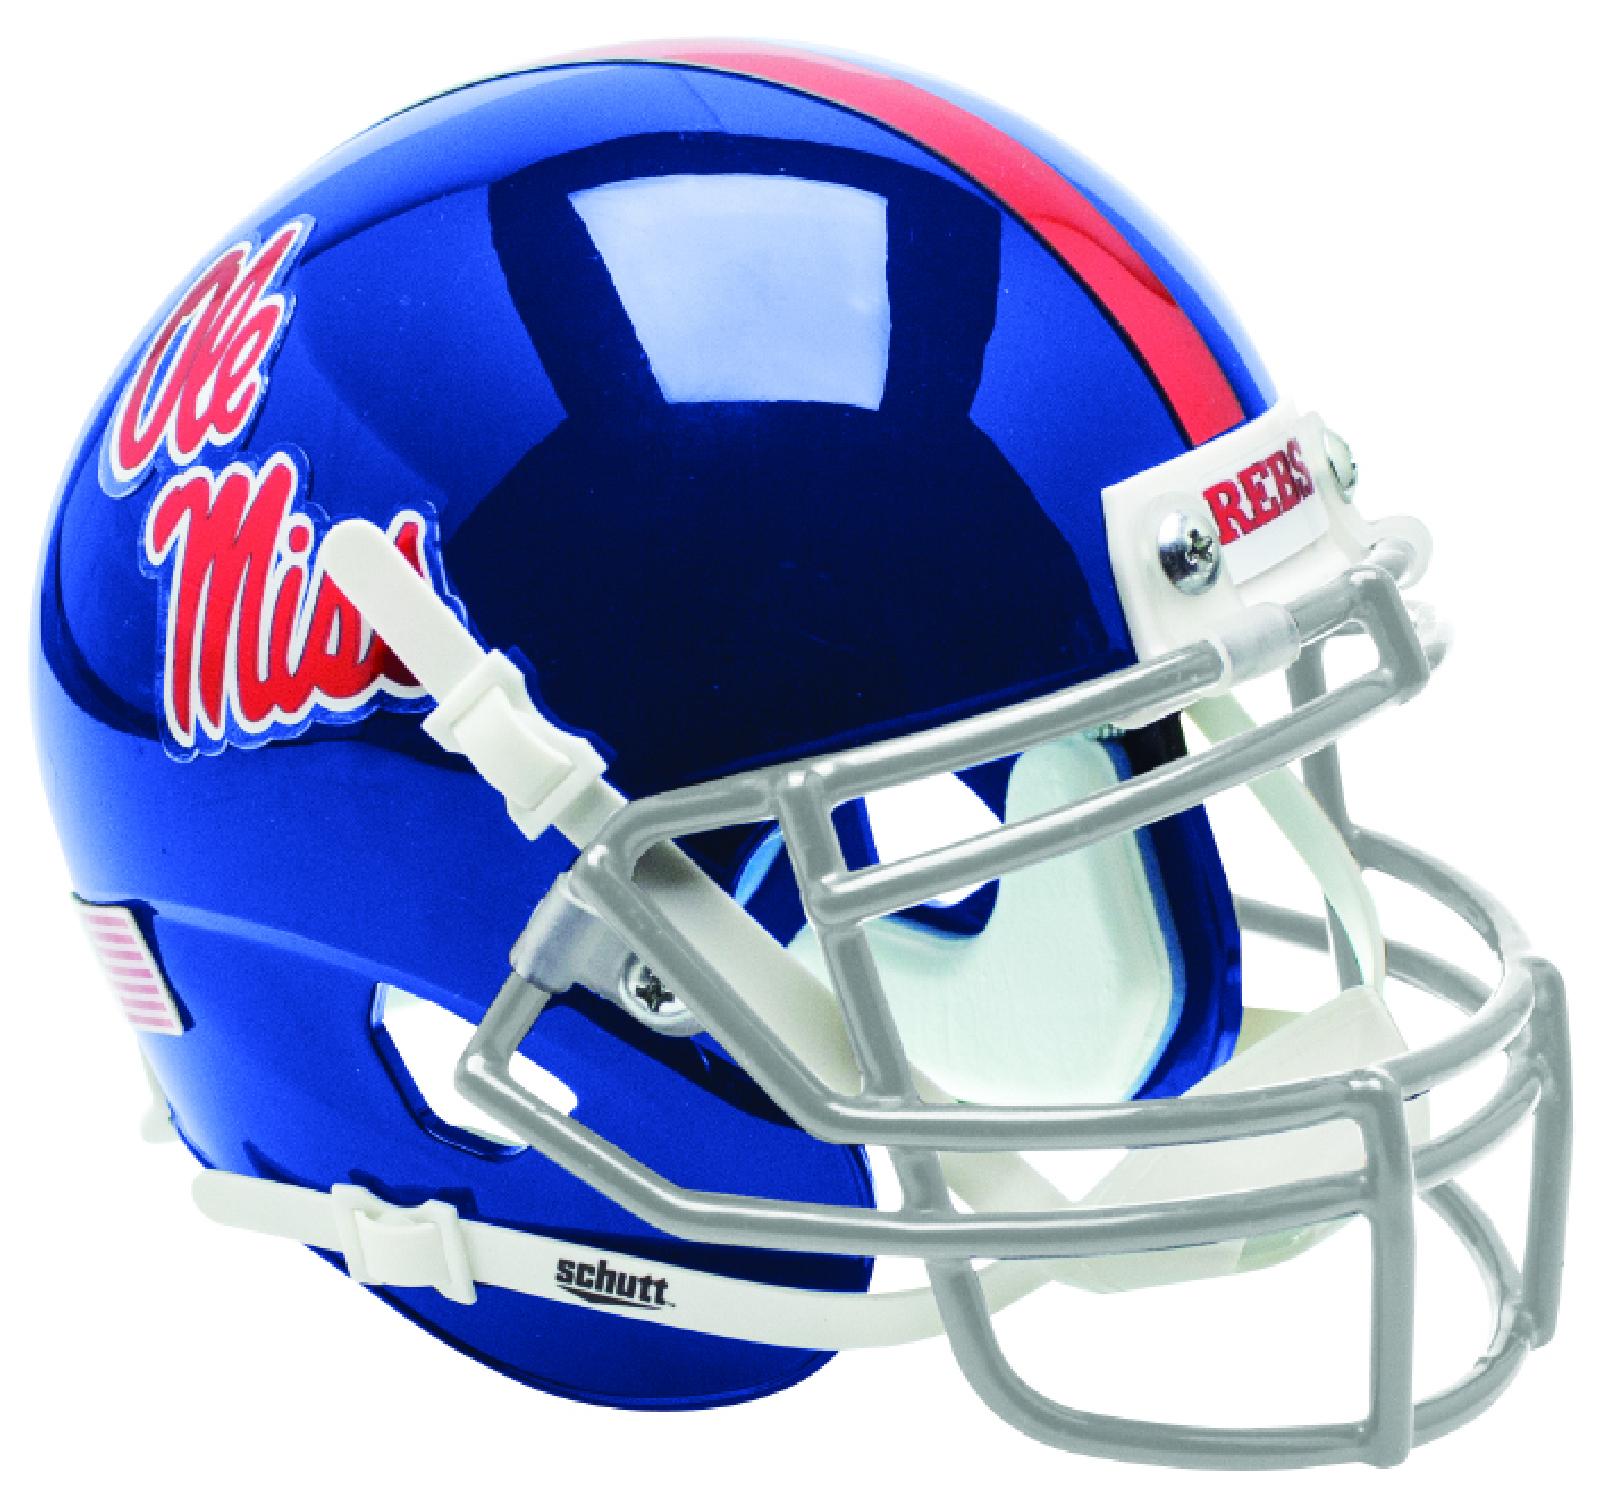 Mississippi (Ole Miss) Rebels Full XP Replica Football Helmet Schutt <B>Blue with Chrome Decal</B>